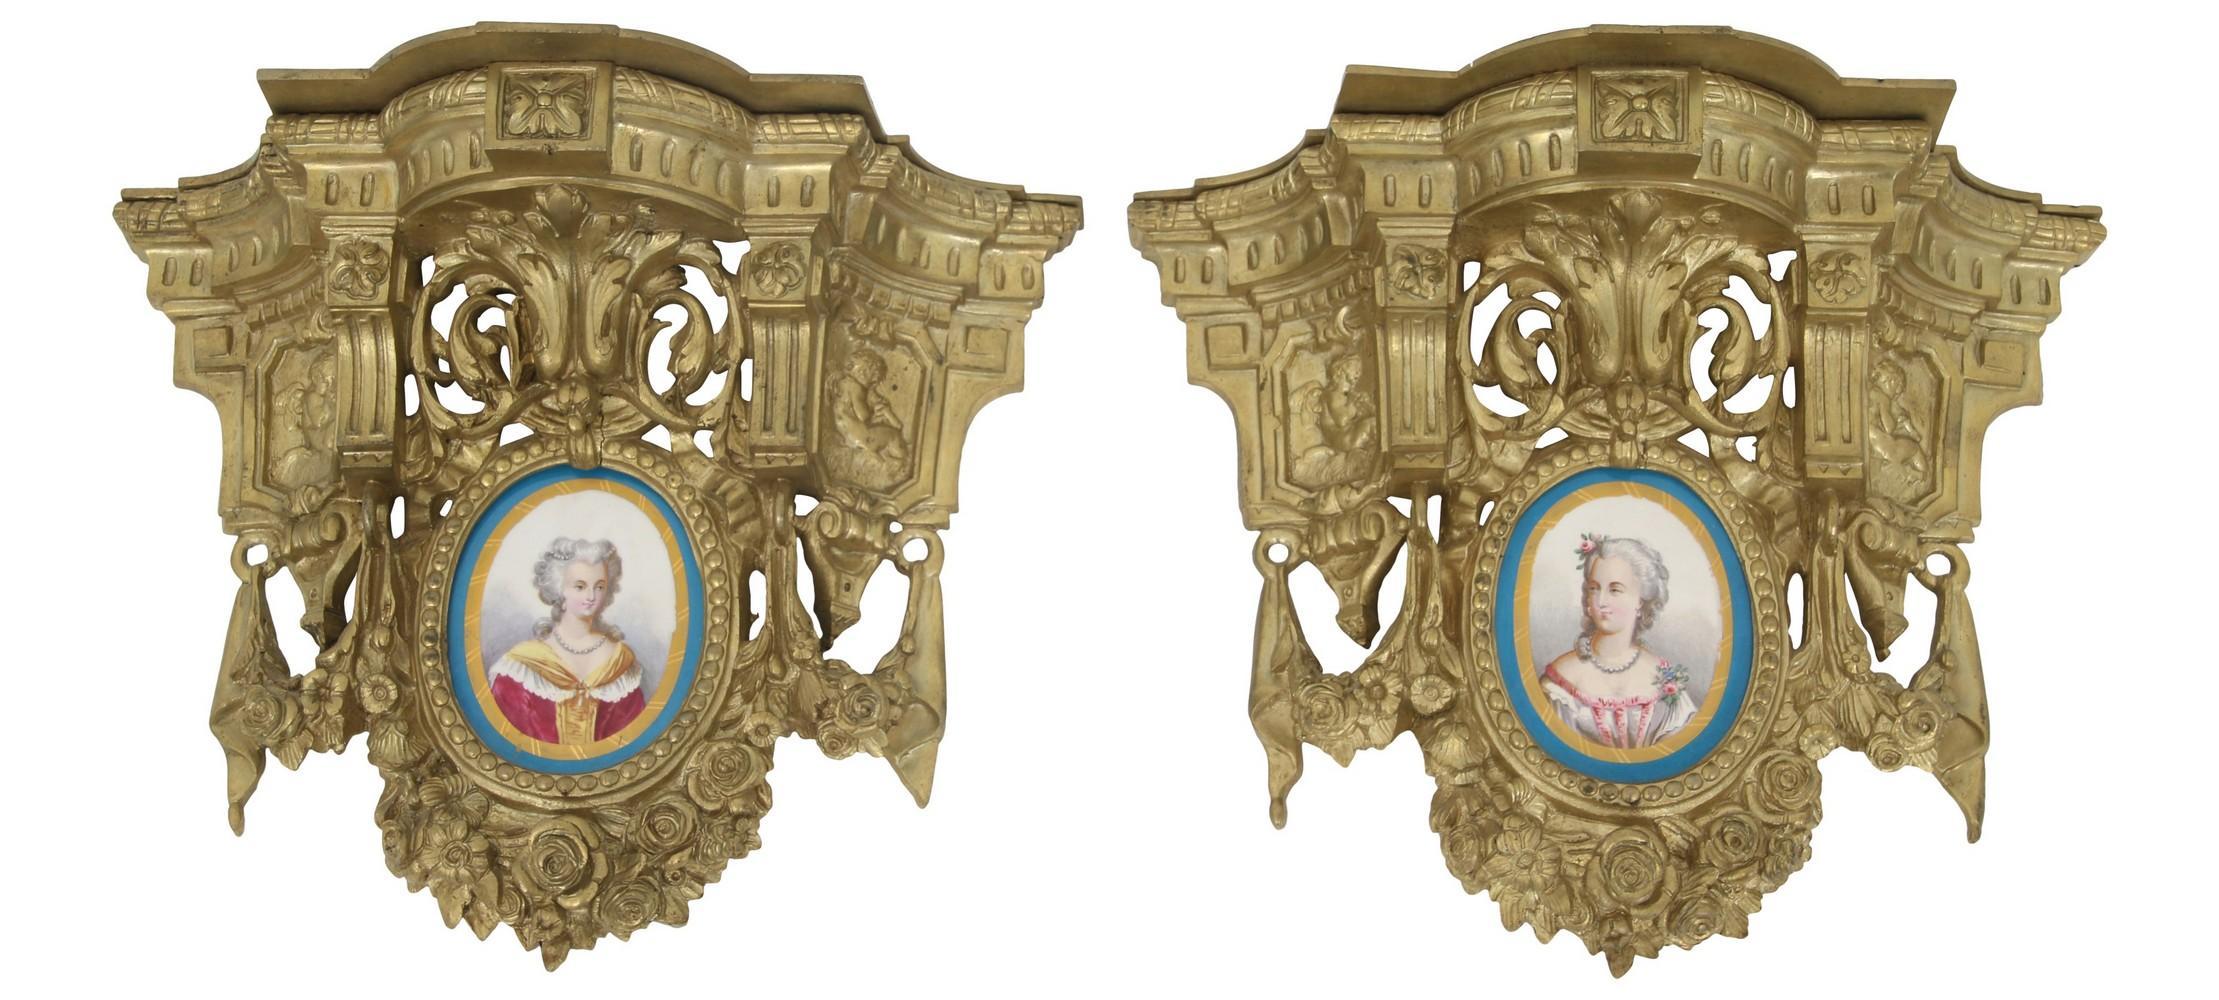 French Gilt Bronze & Porcelain Wall Shelves